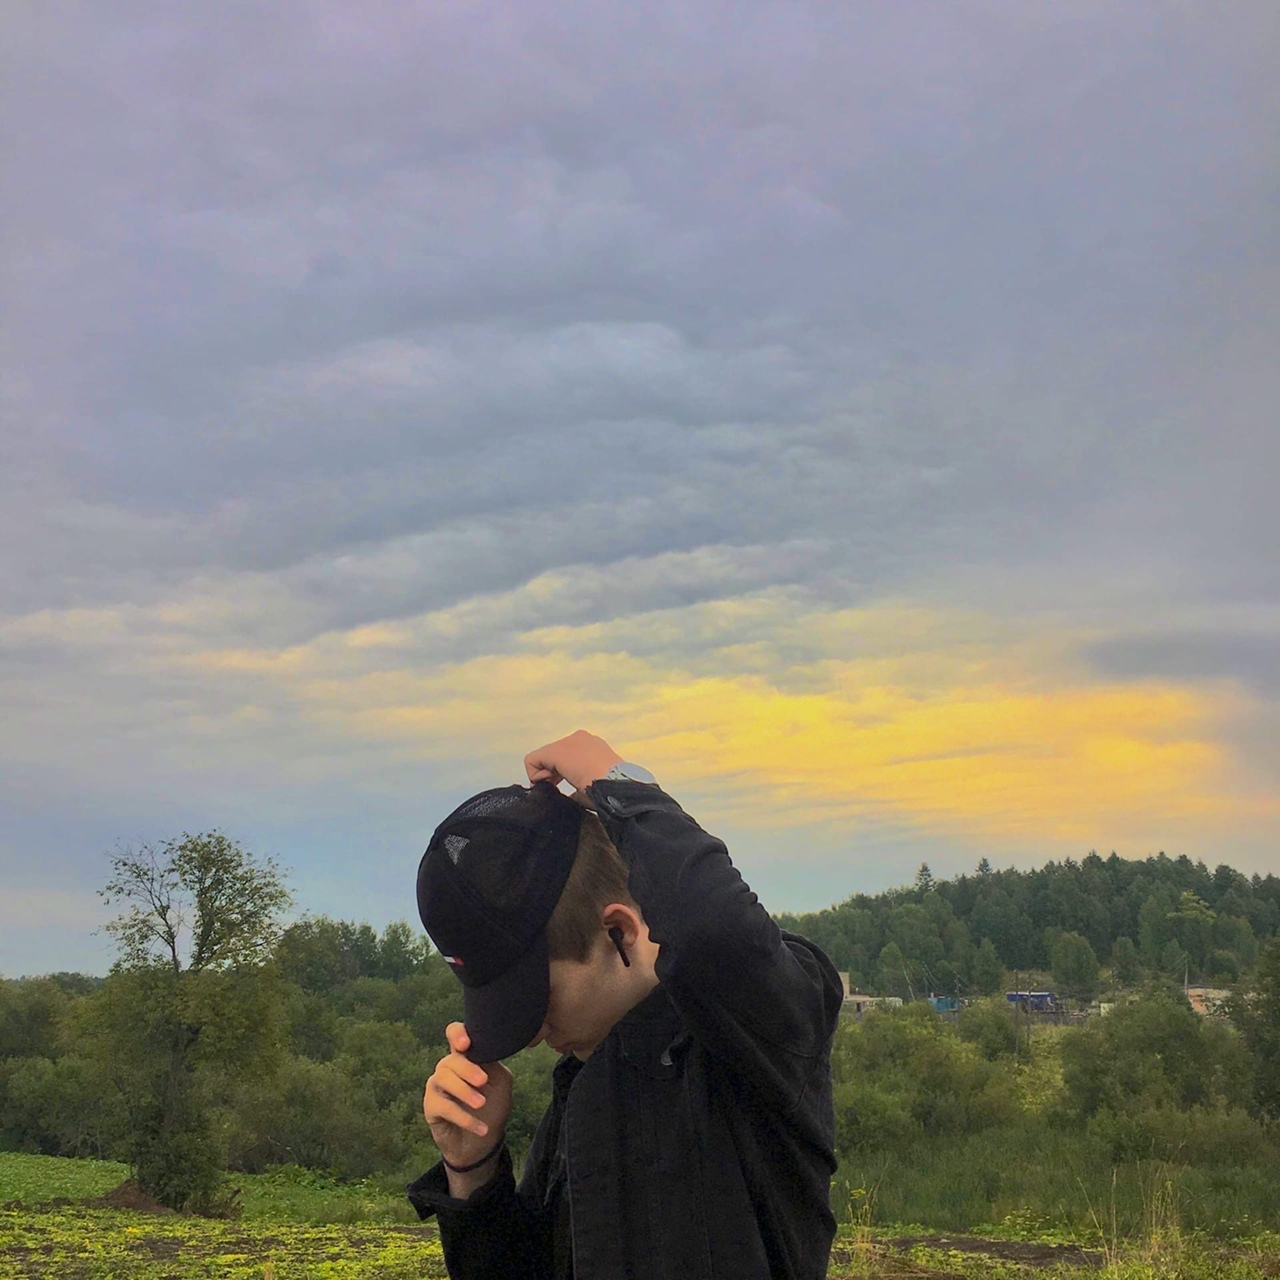 фото из альбома Саши Тенигина №9